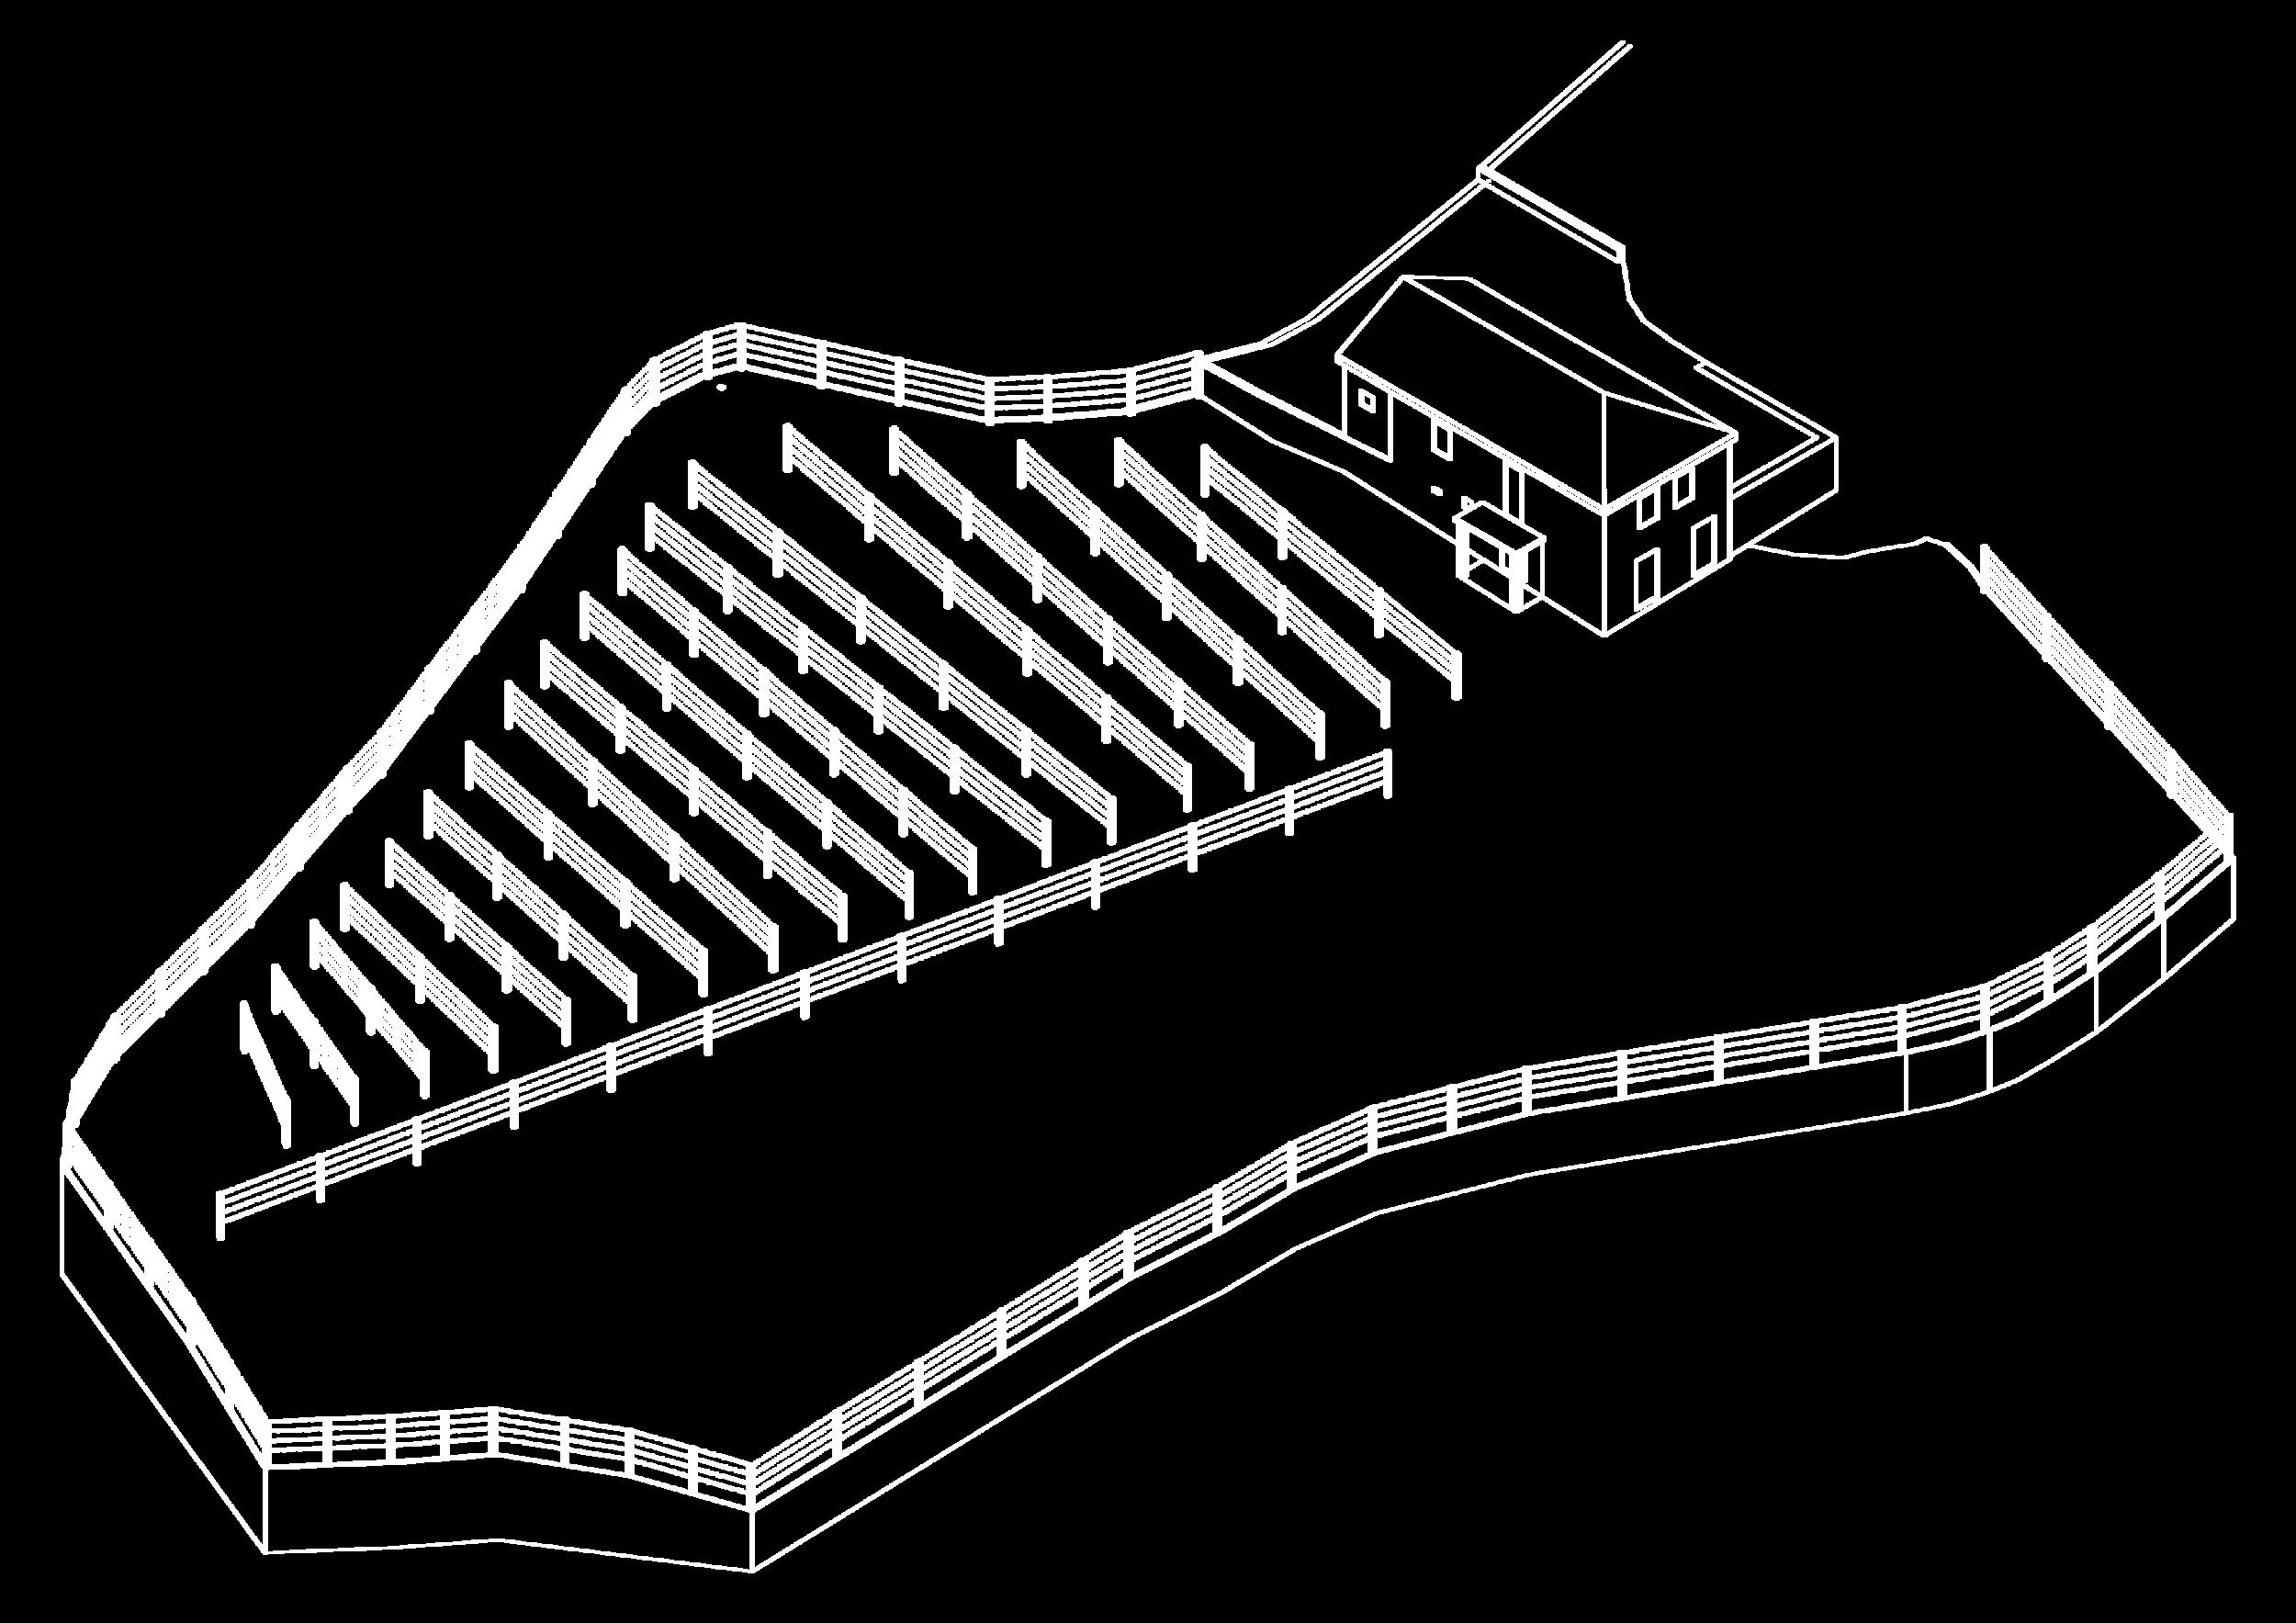 rhrc layout1-01.png